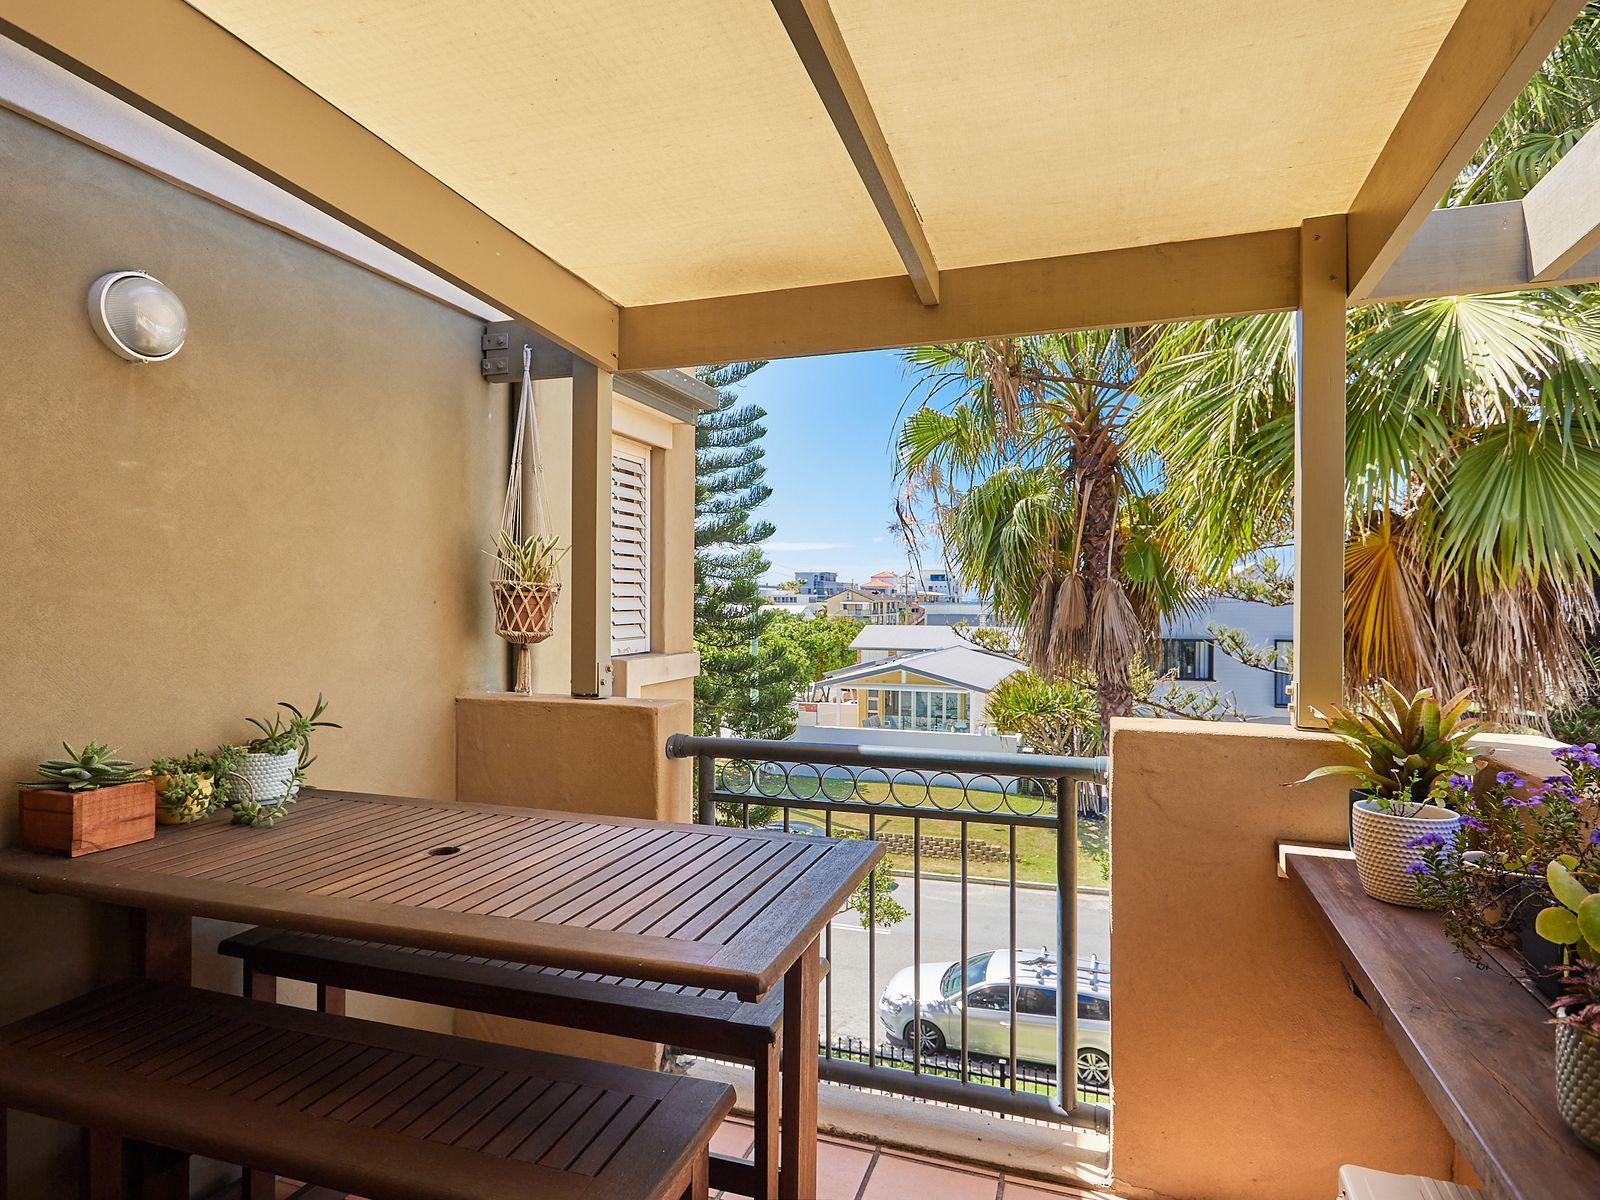 27/38 Petrel Avenue, Mermaid Beach, QLD 4218